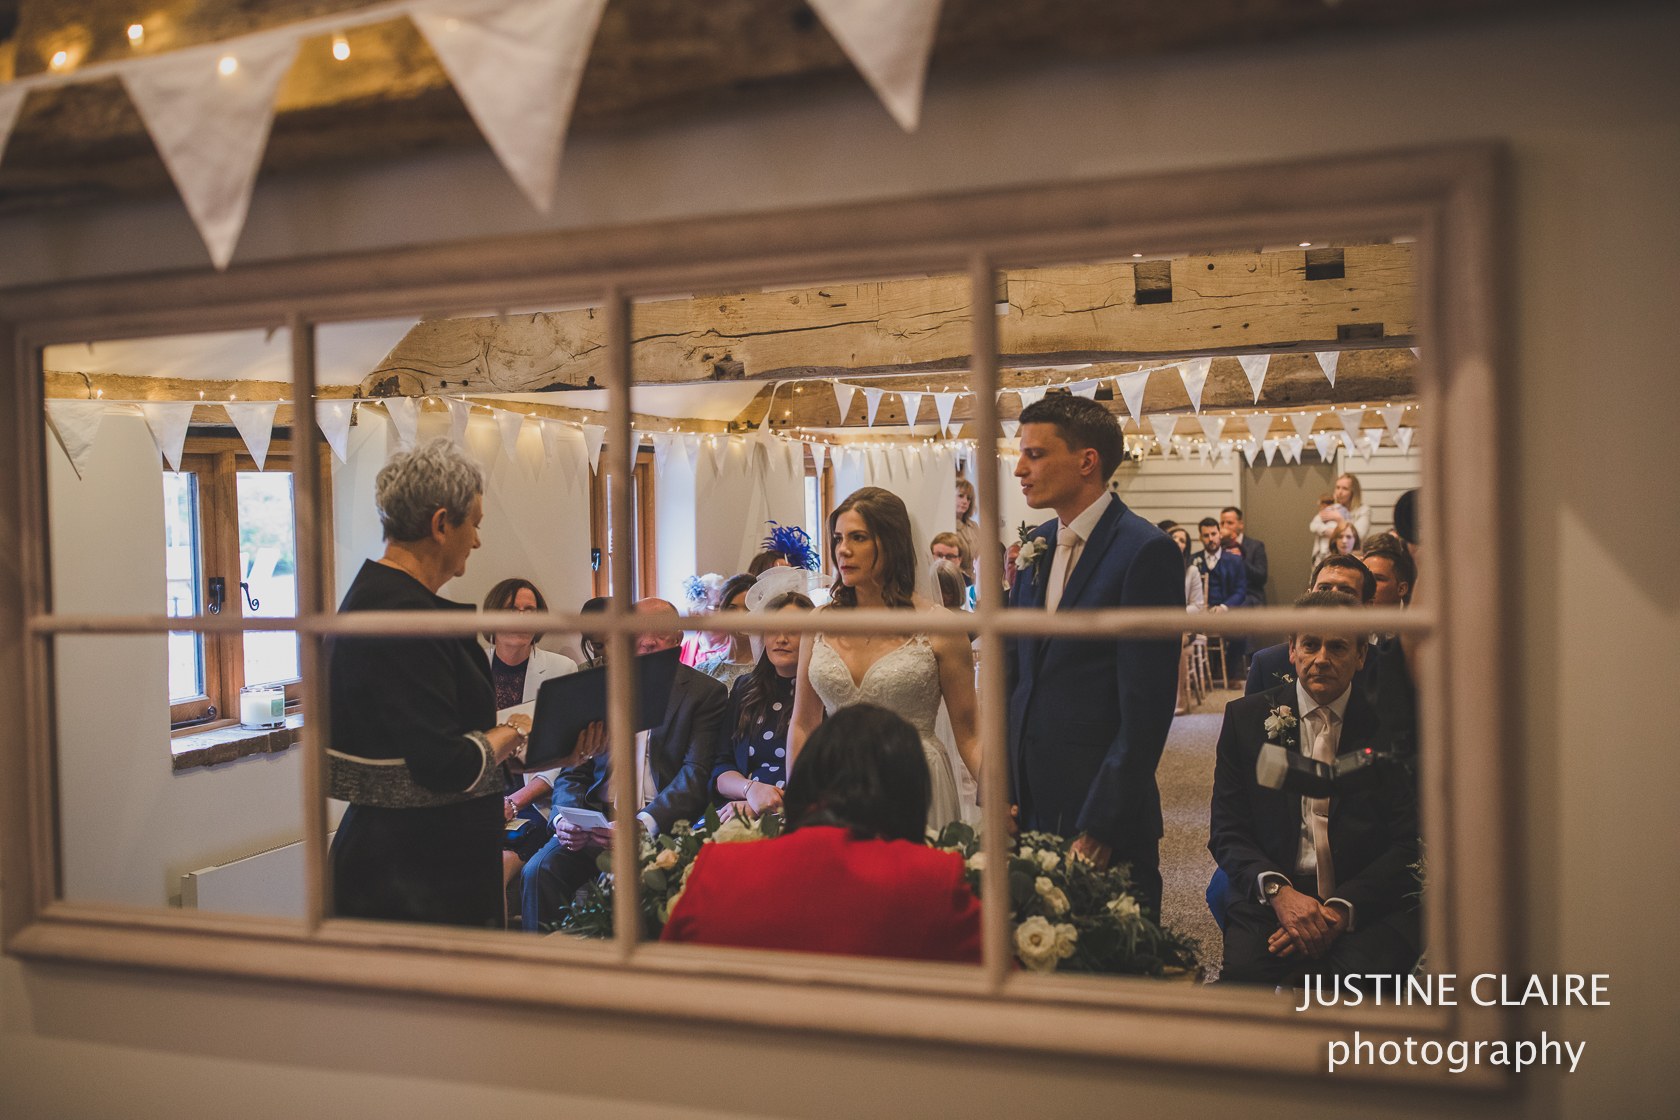 Fitzleroi Fittleworth petworth Billingshurst farm Wedding Photography by Justine Claire photographer Arundel Worthing Brighton-19.jpg